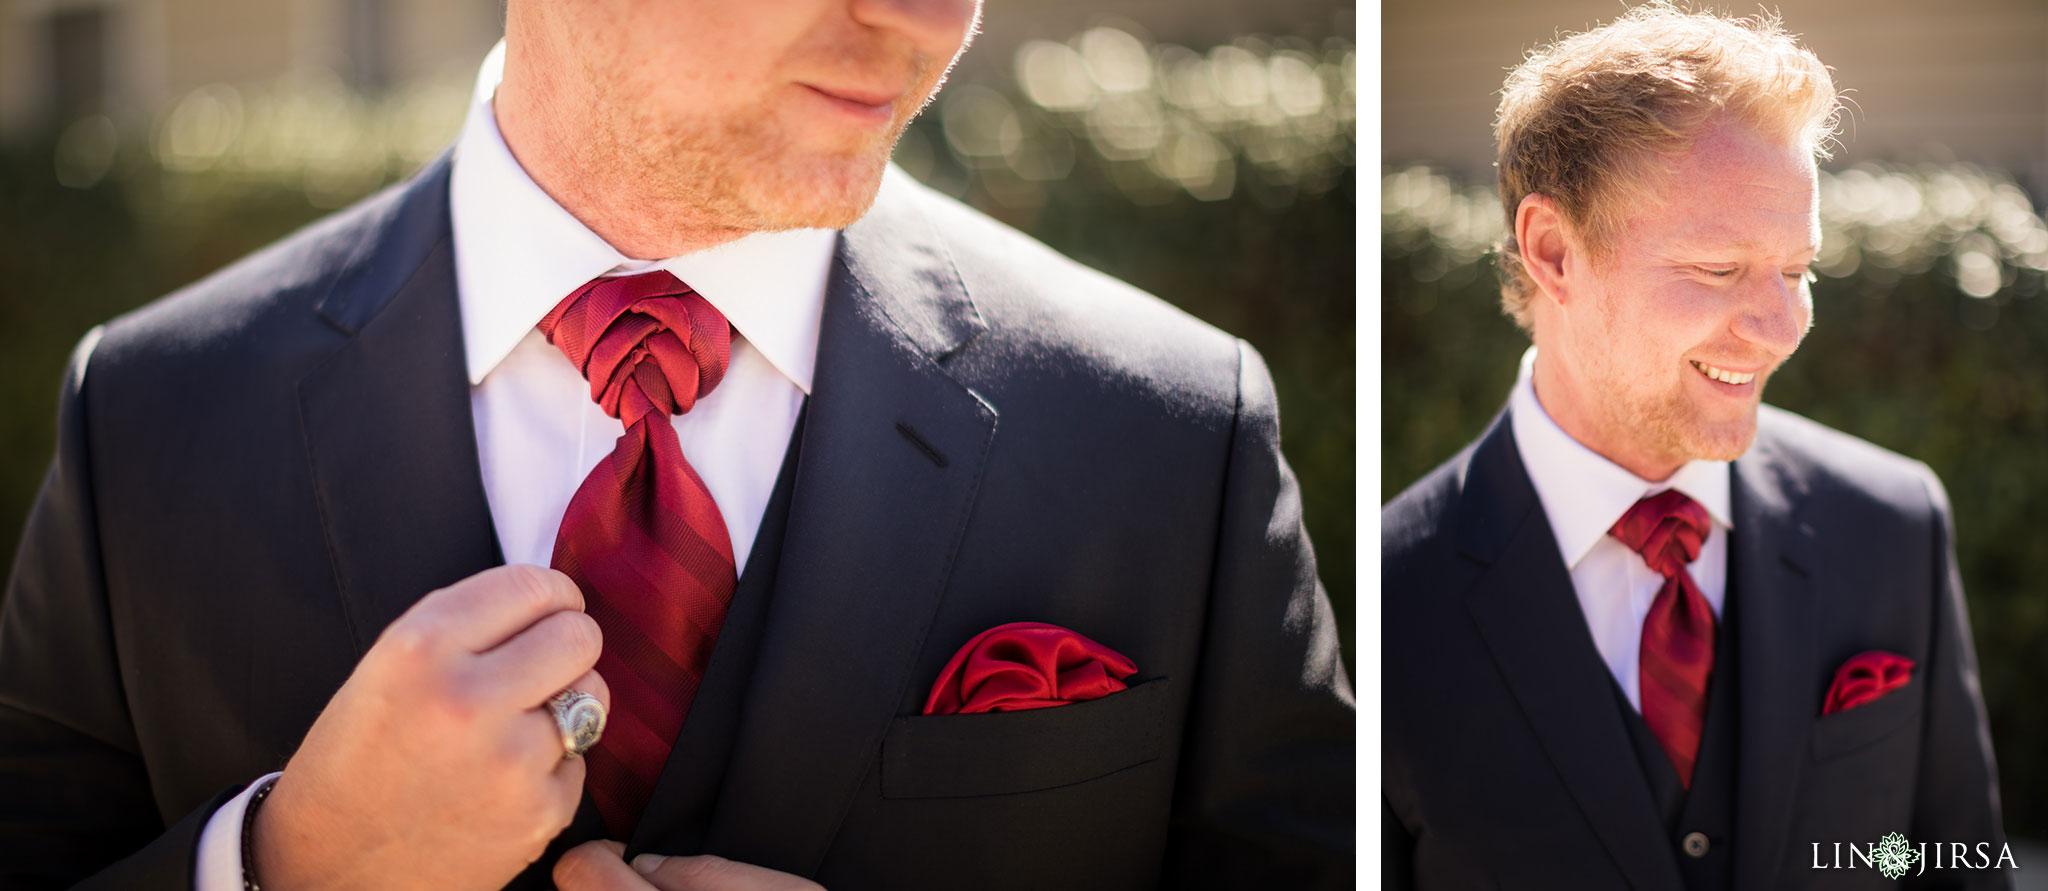 10 altadena town country club pakistani groom wedding photography